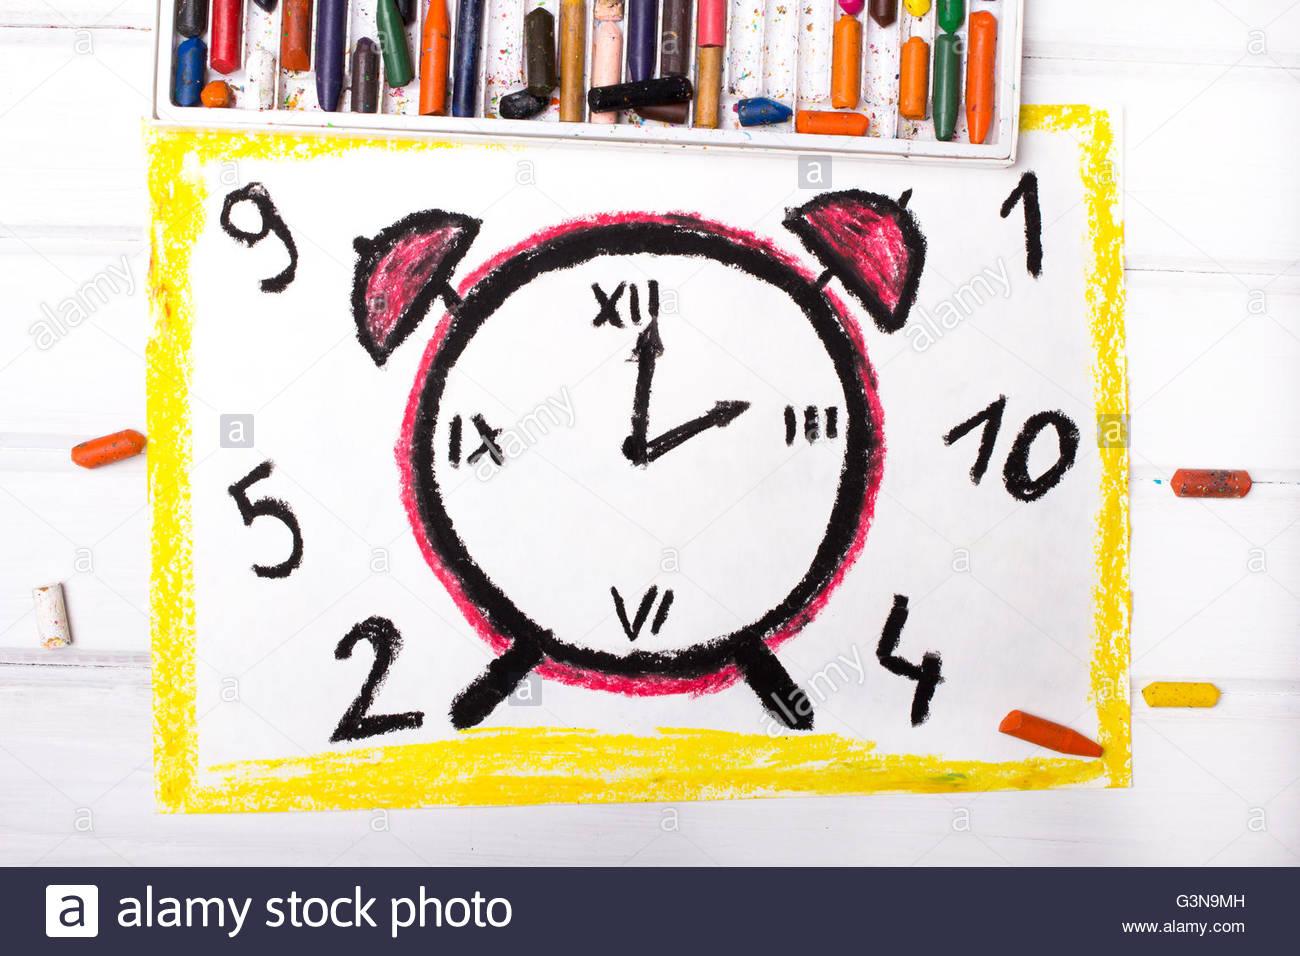 1300x956 Colorful Drawing Alarm Clock Stock Photo 105574801